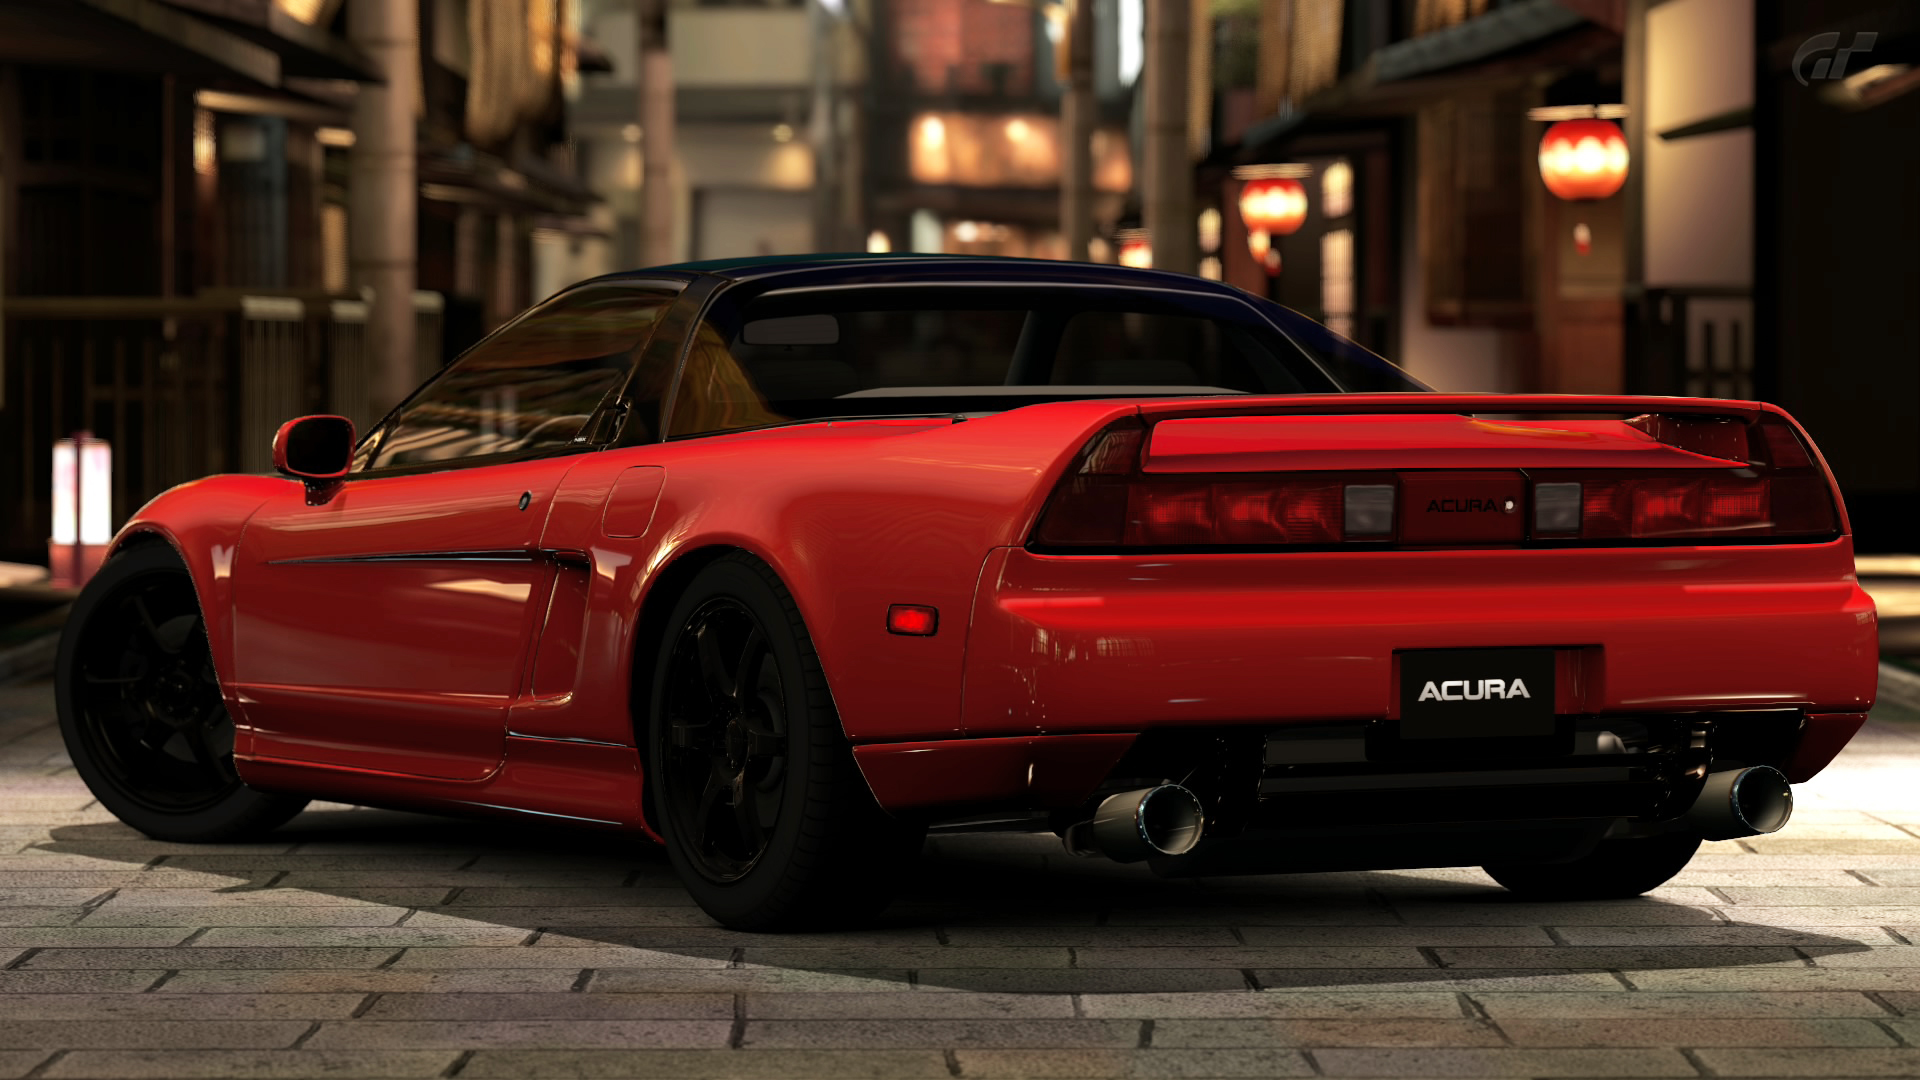 ... 1991 Acura NSX (Gran Turismo 5) By Vertualissimo